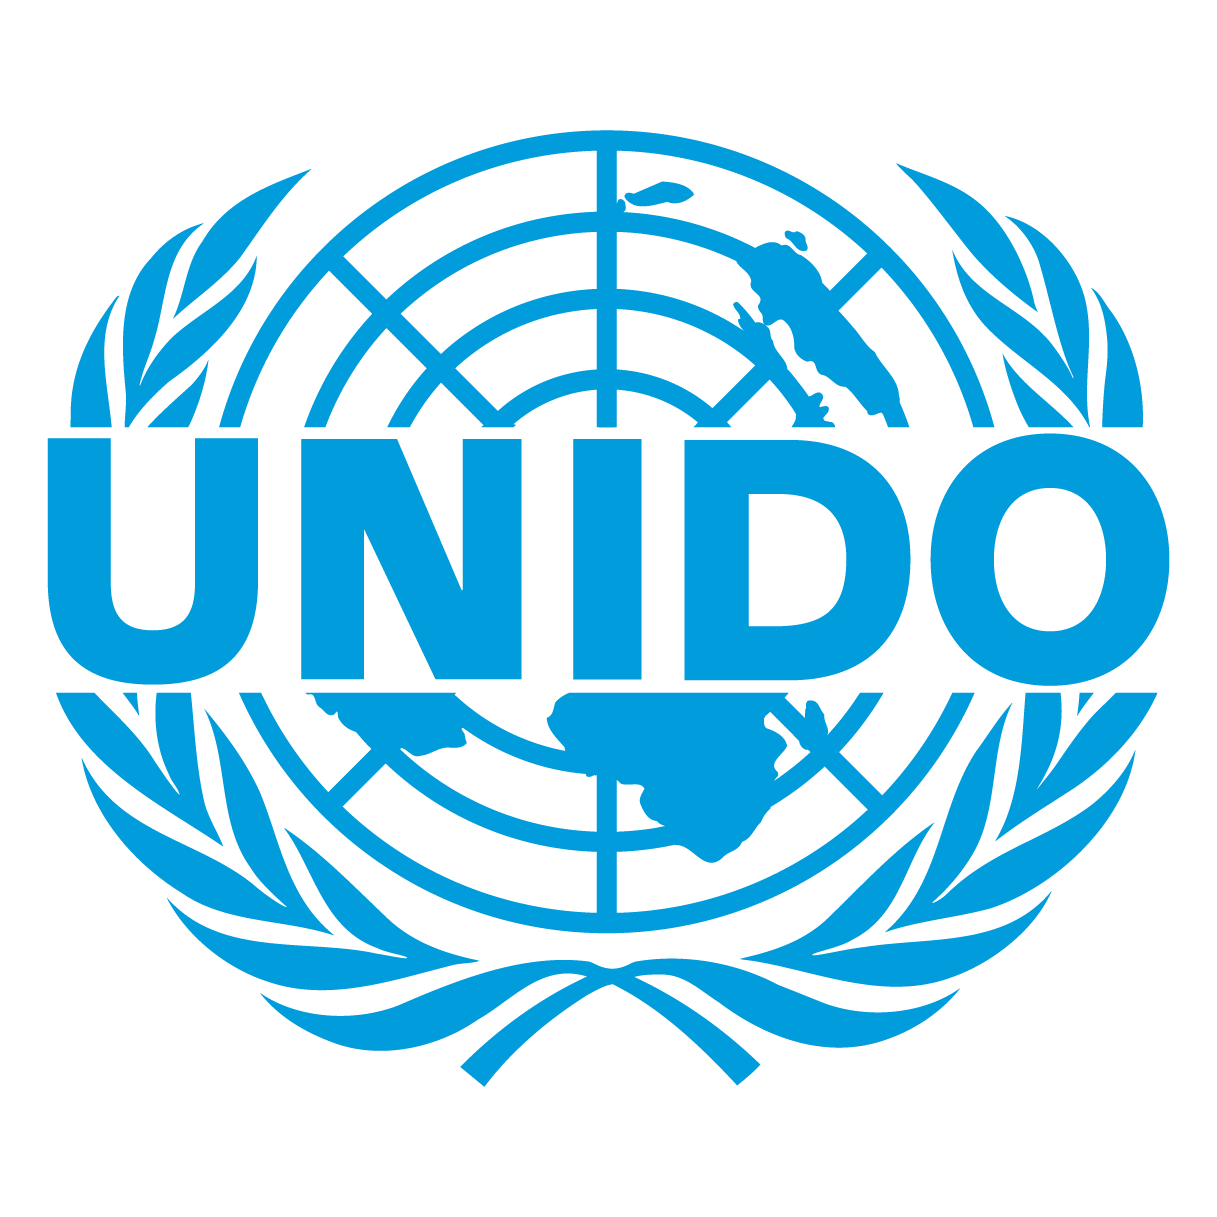 UNIDO - United Nations Industrial Development Organization